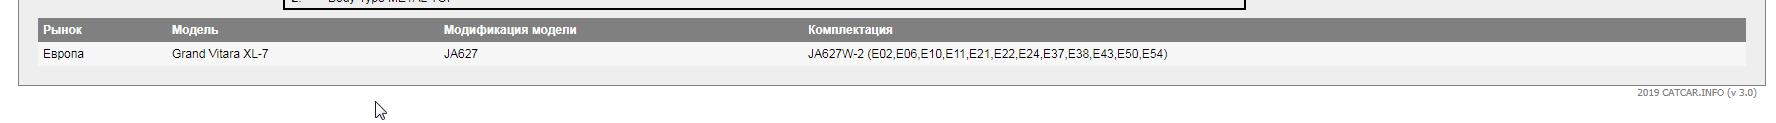 bb44a9ef52b865a207dc2df167a70dfc.png